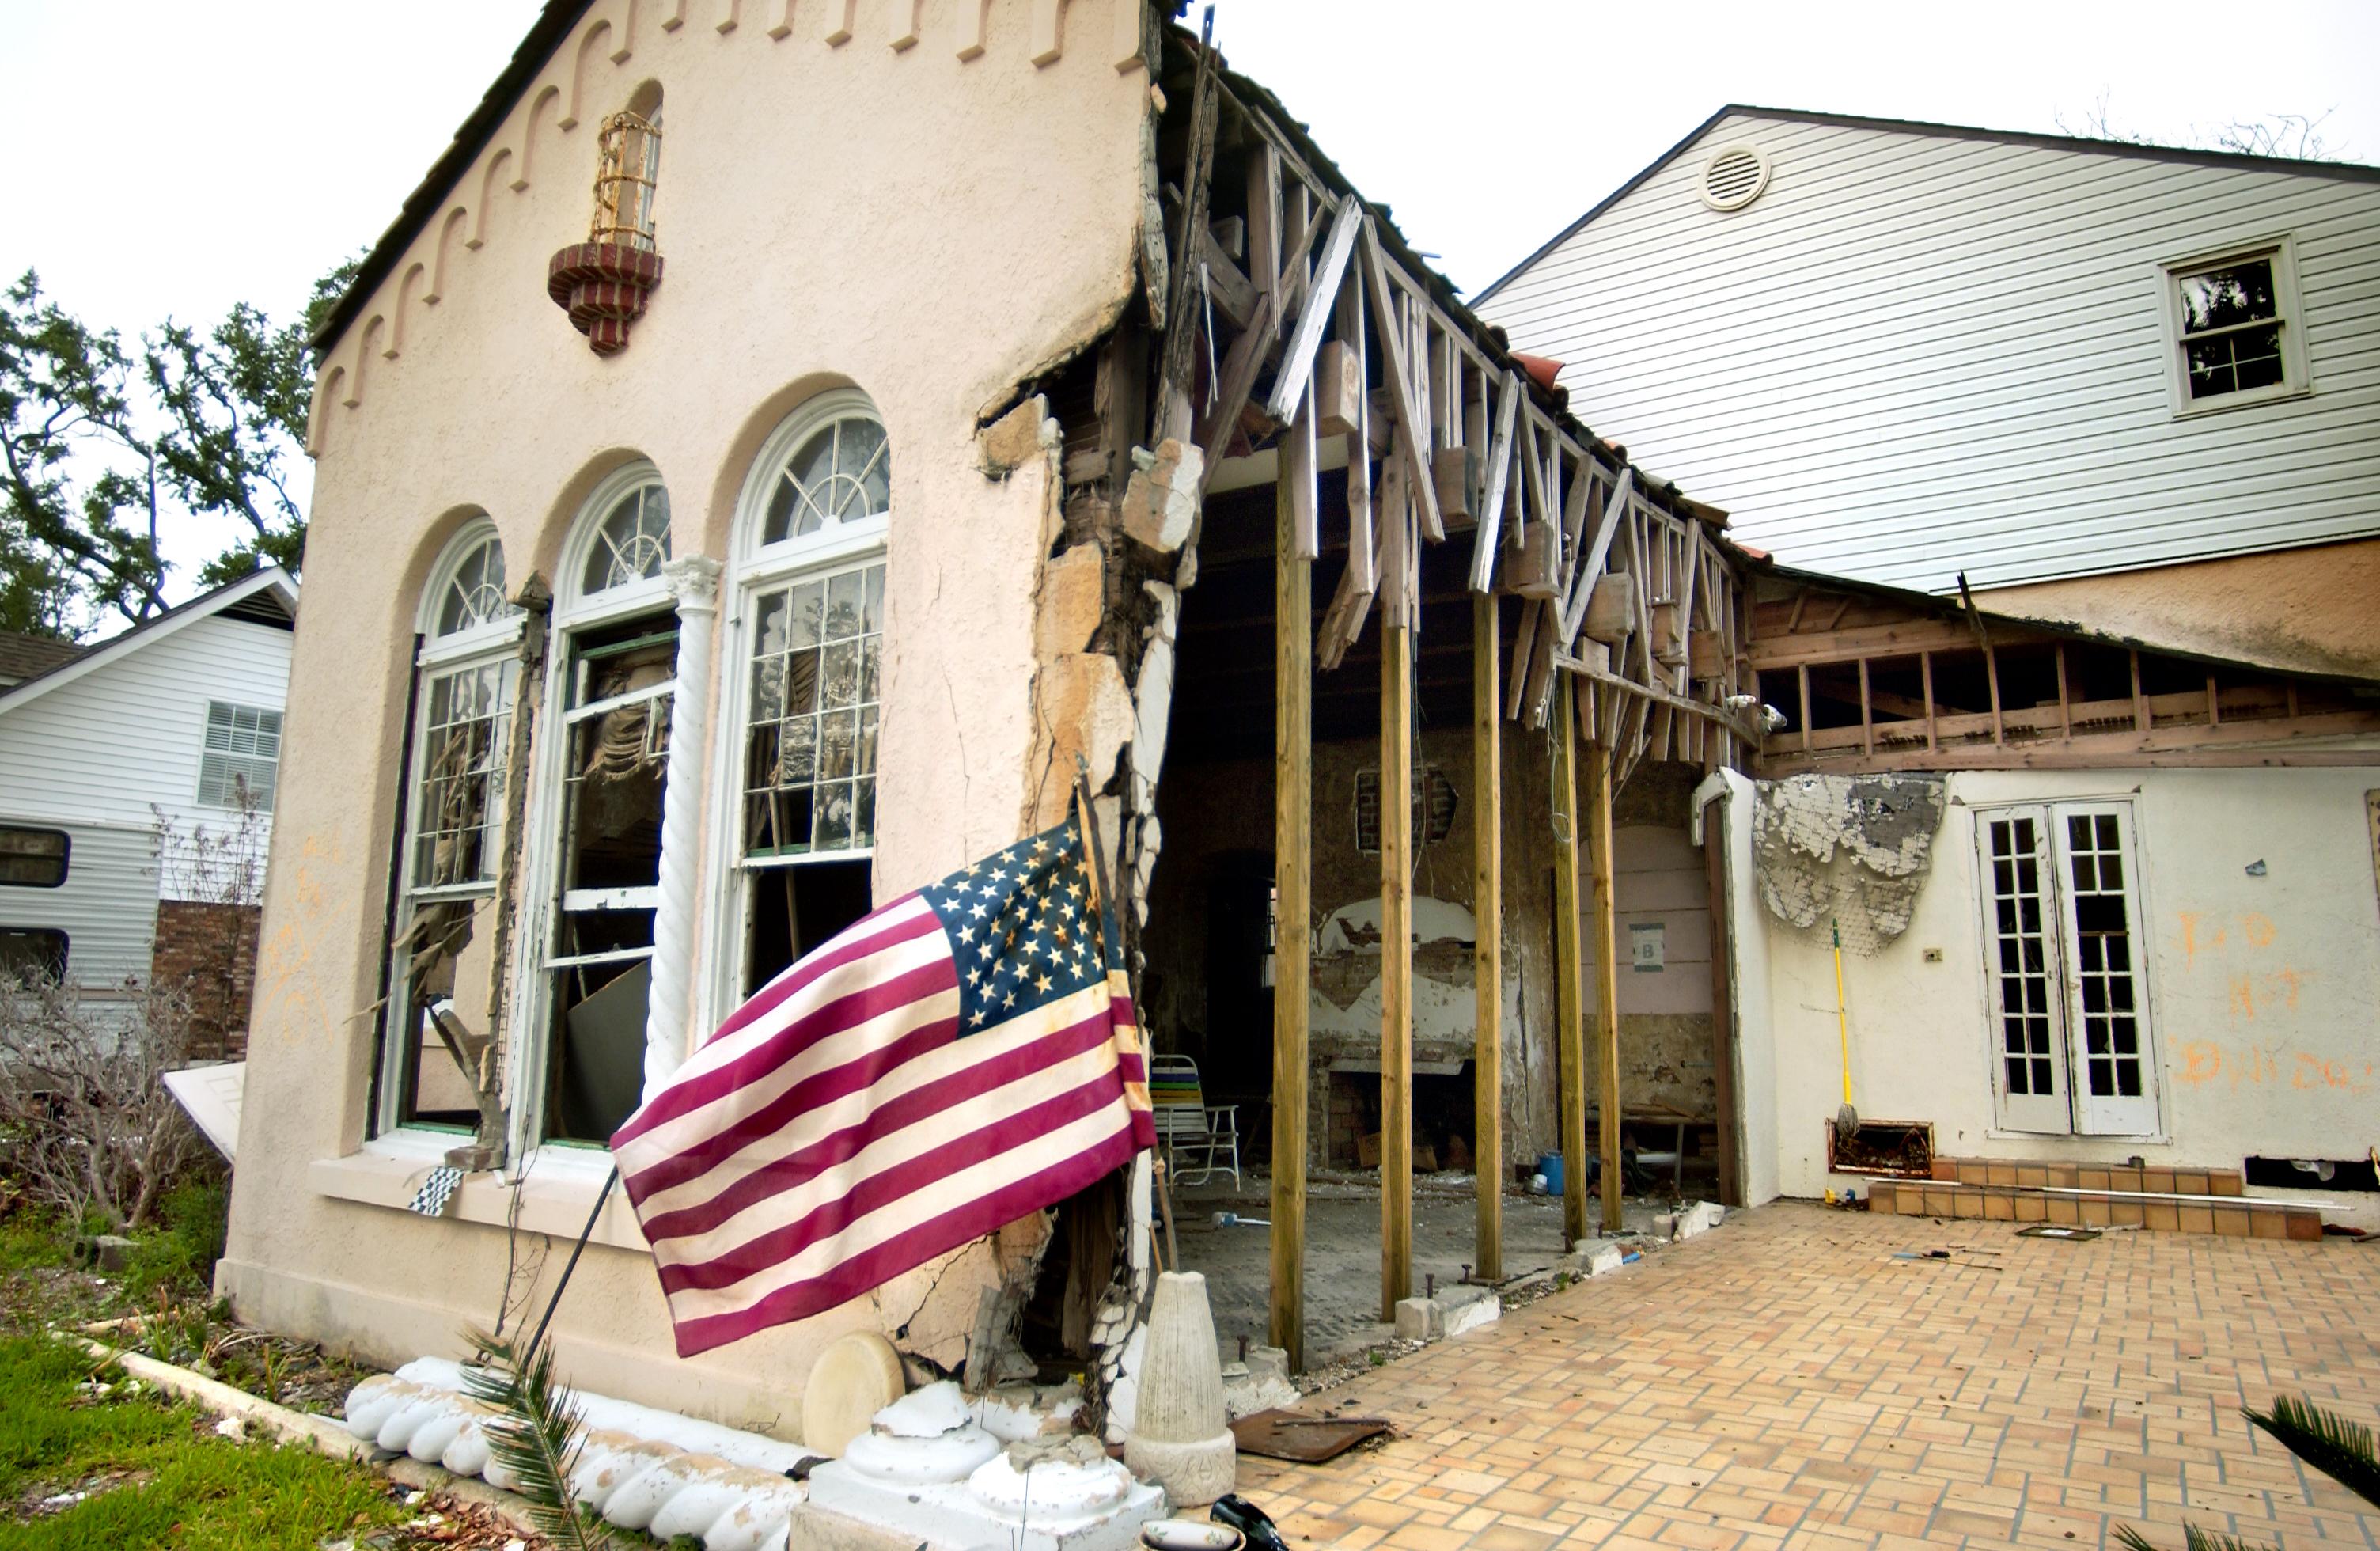 Hurricane-Residential-Insurance-Claim-Adjusters-International-Basloe-Levin-Cuccaro